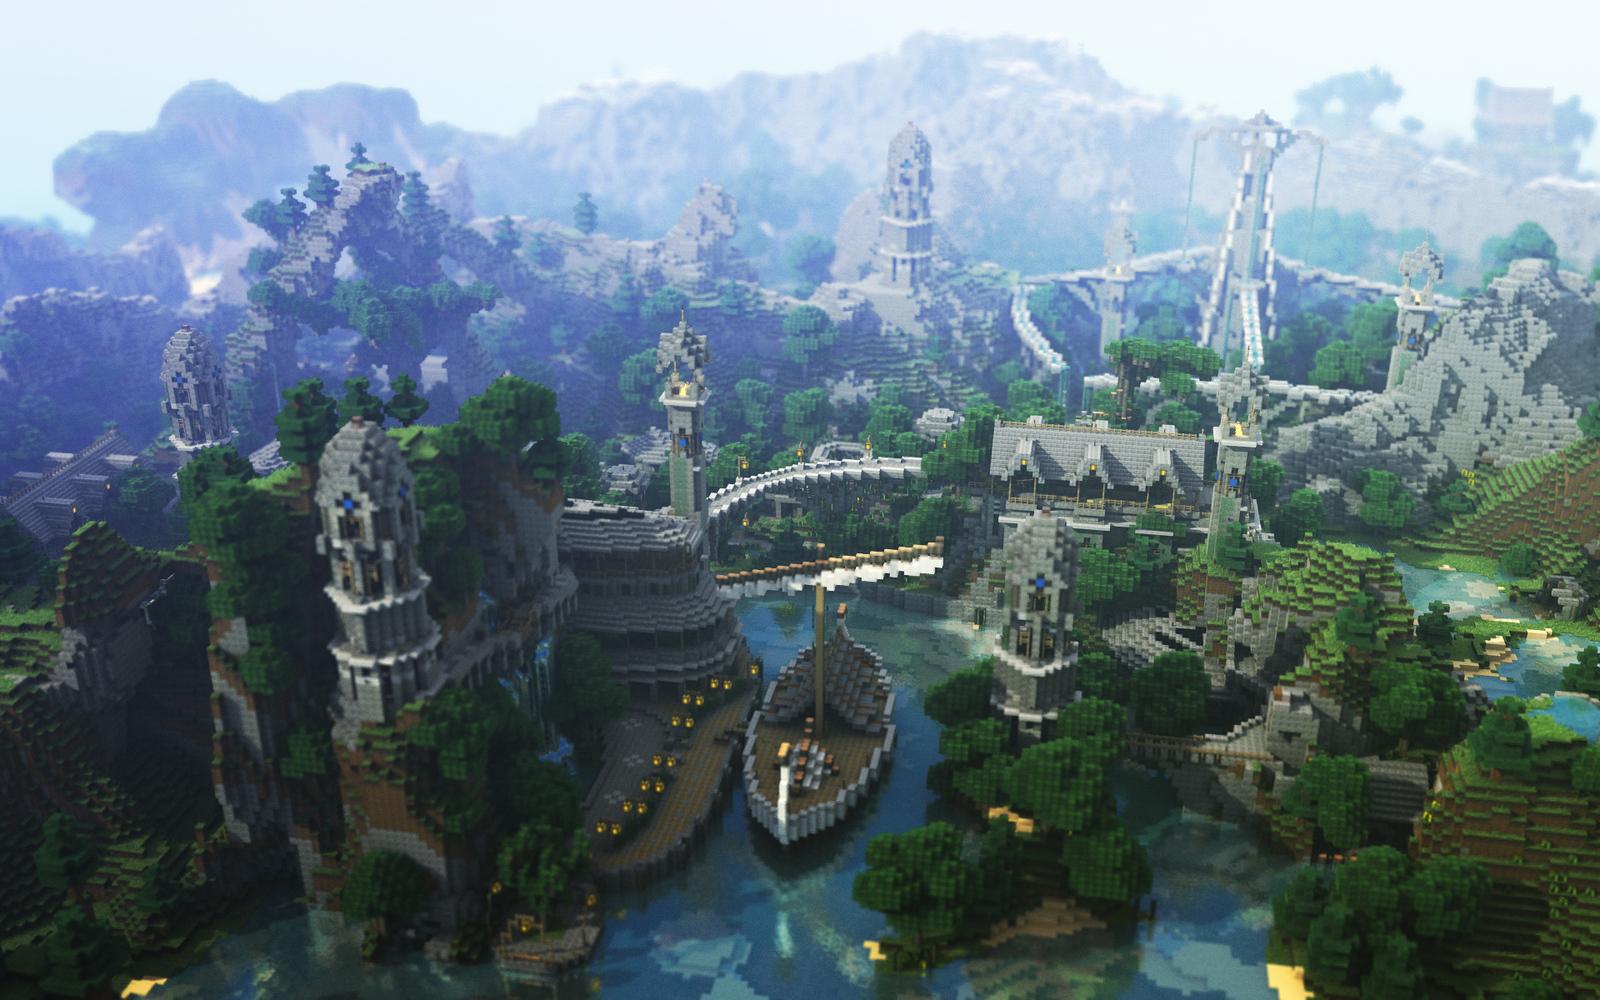 Minecraft wallpaper paysage hxe3 village montagne jeux for Paysage wallpaper